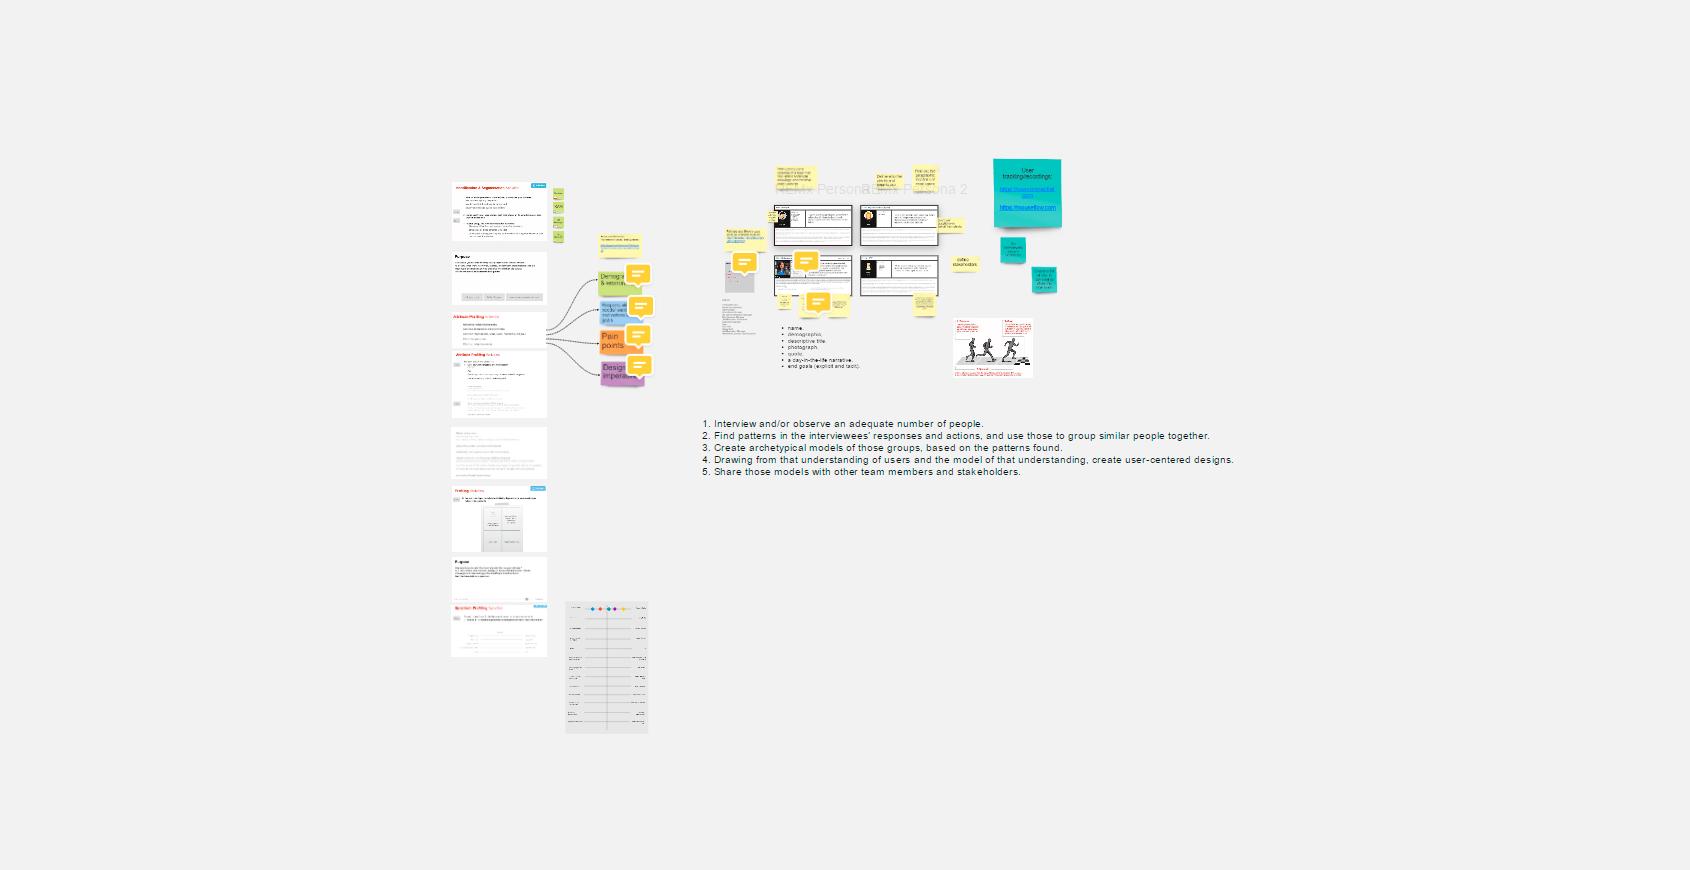 Brainstorming Customer's Persona - by Freelance UX designer Mandy Robinson